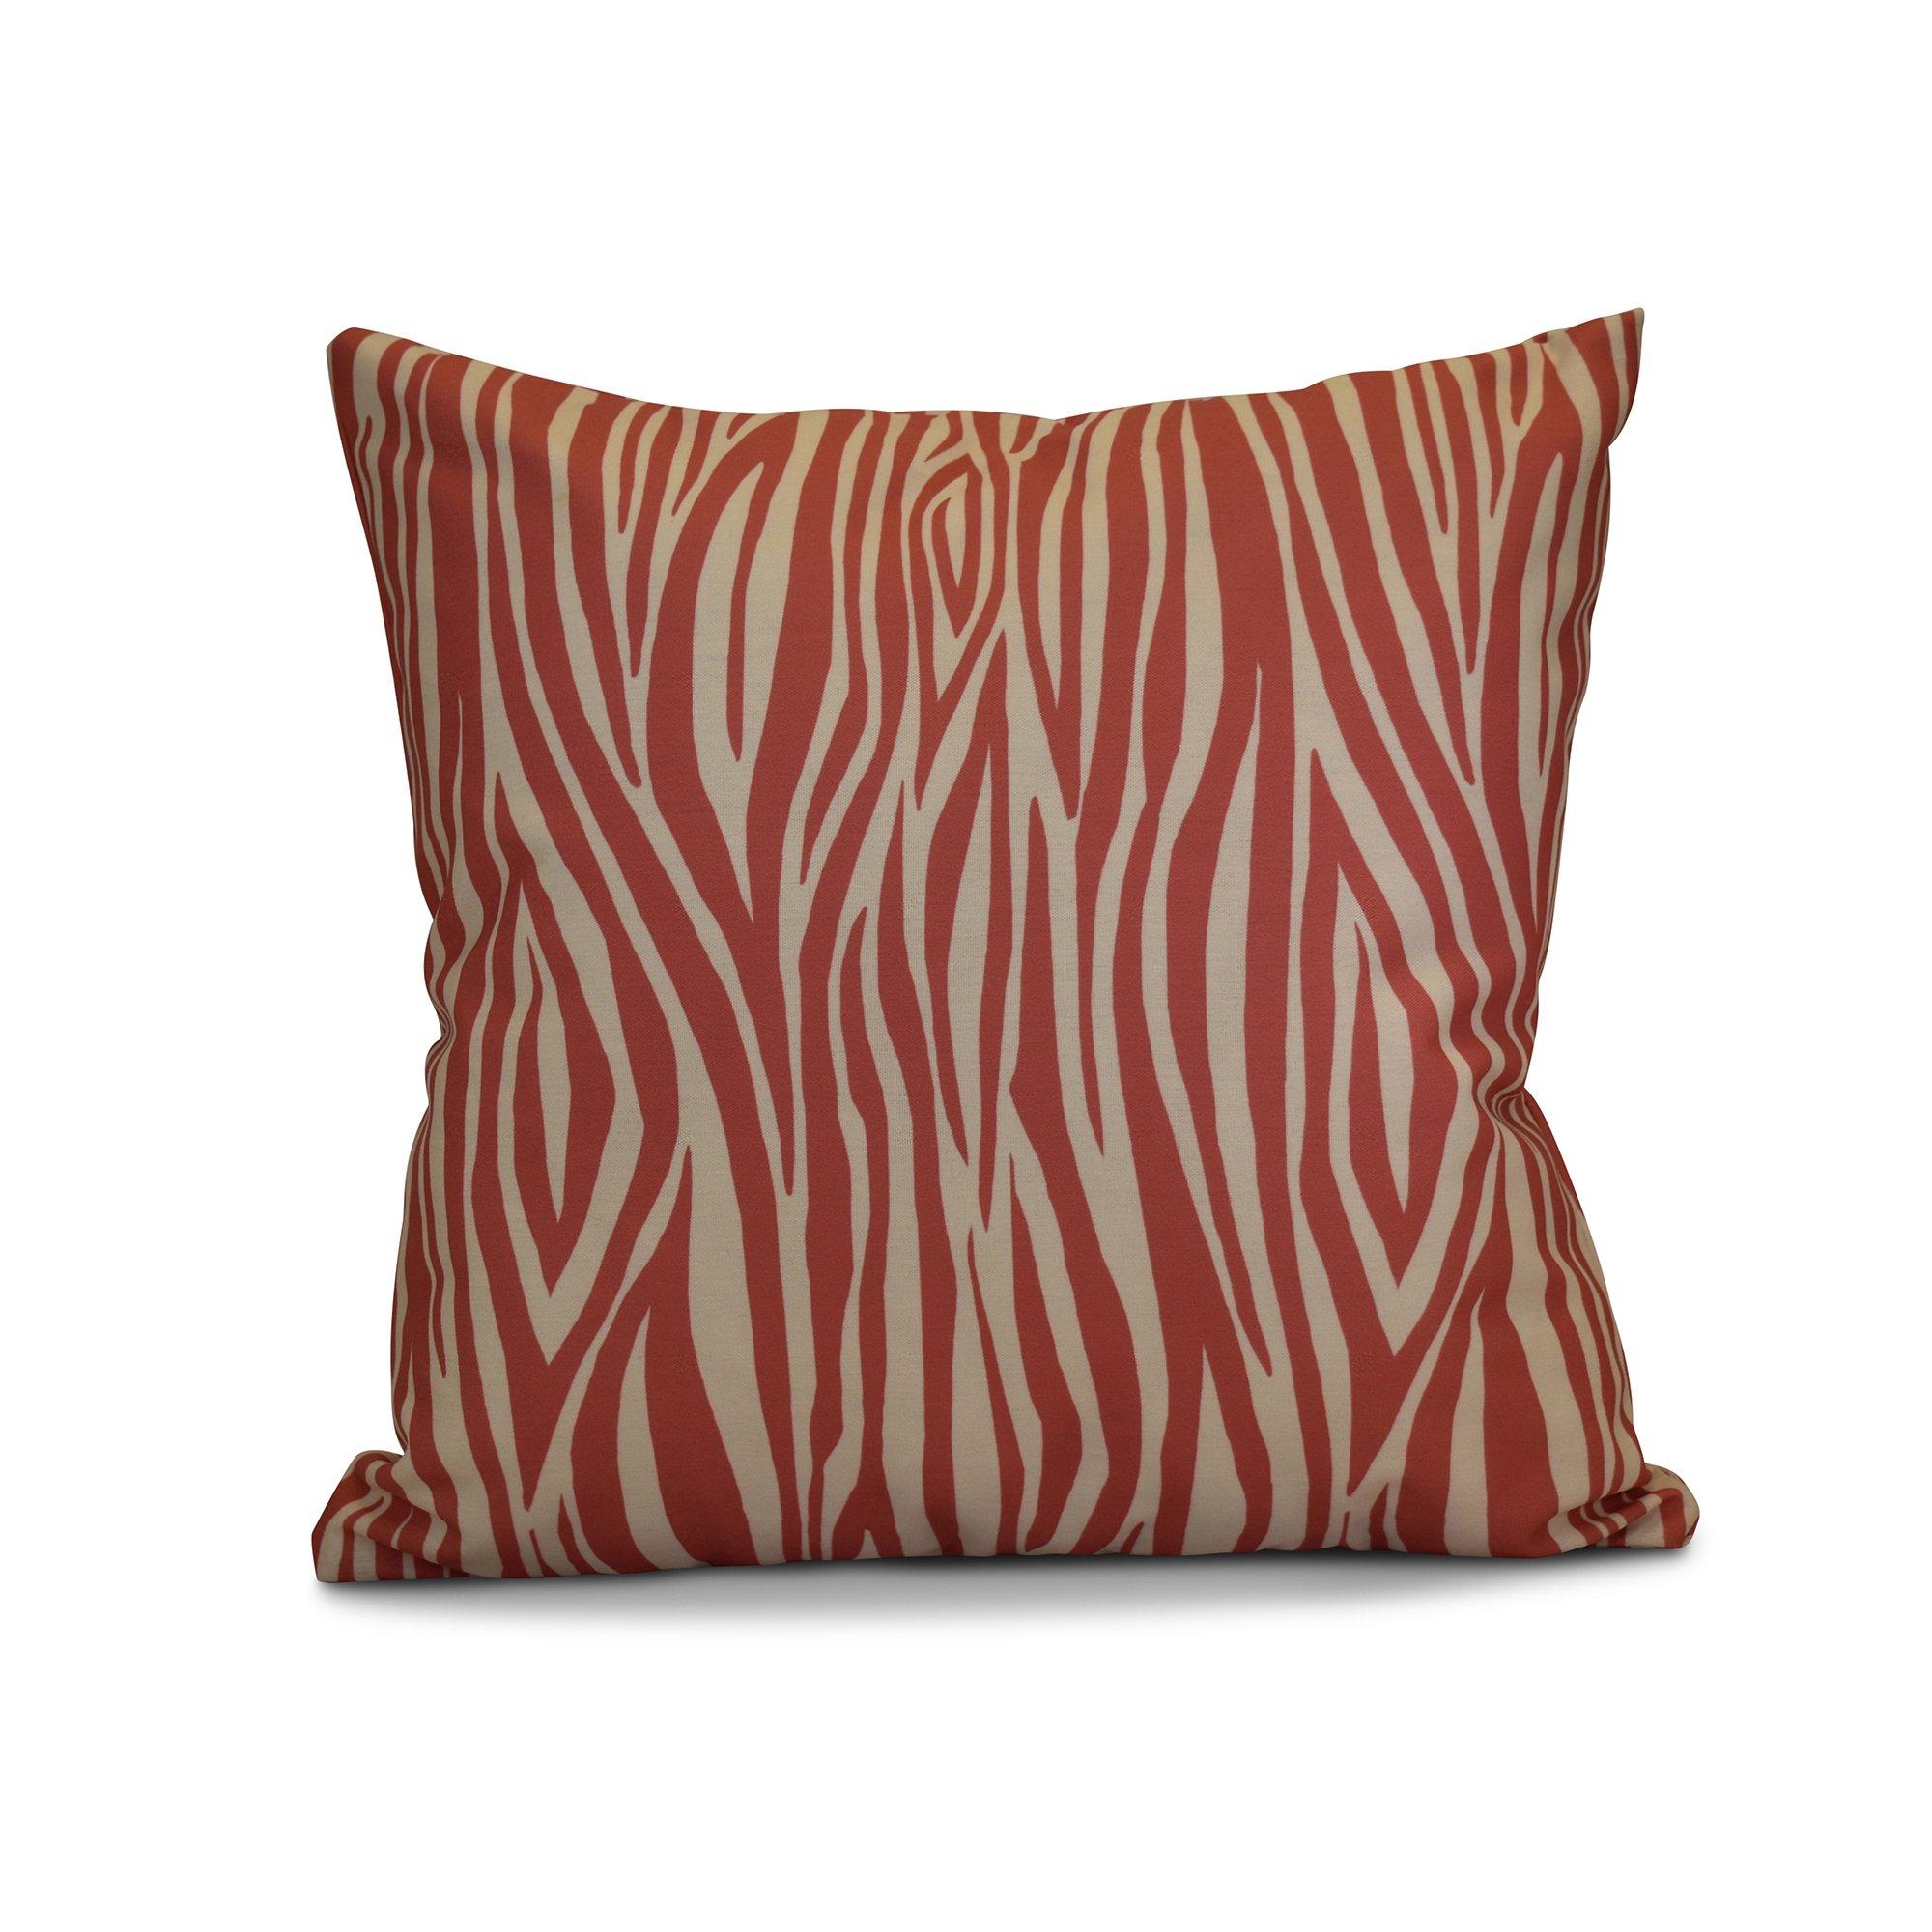 E by design 16 x 16-inch, Wood Stripe, Geometric Print Pillow, Coral